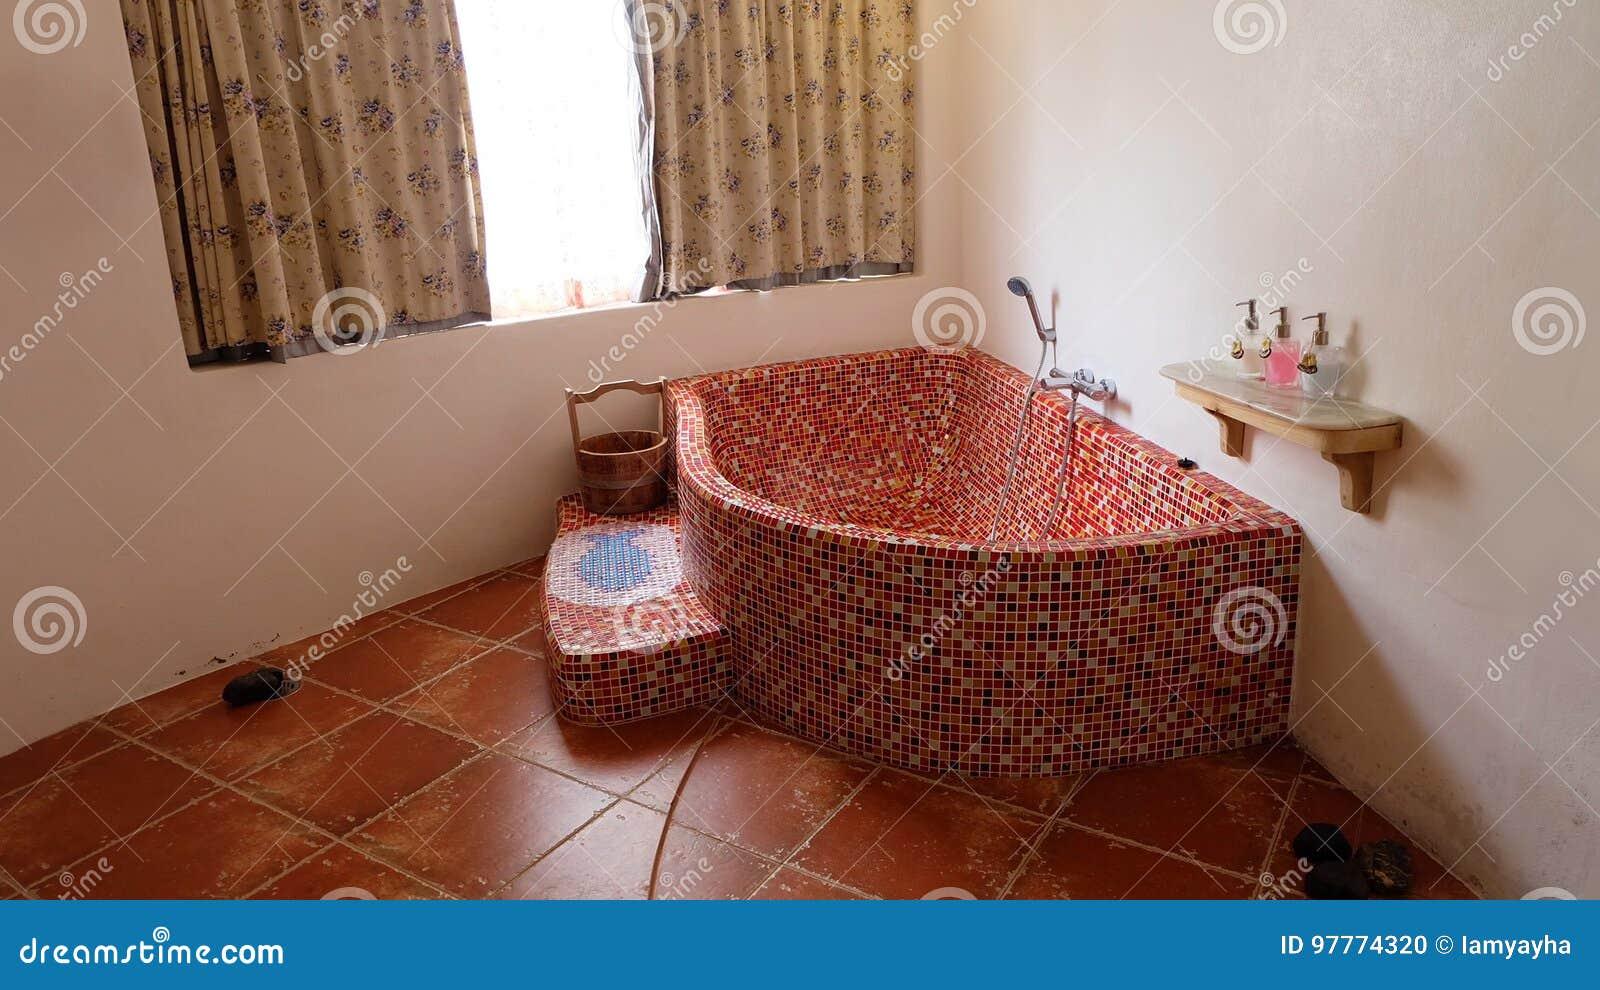 Bathroom Interior In Vintage Bathtub Ceramic With Shower Home Stock ...